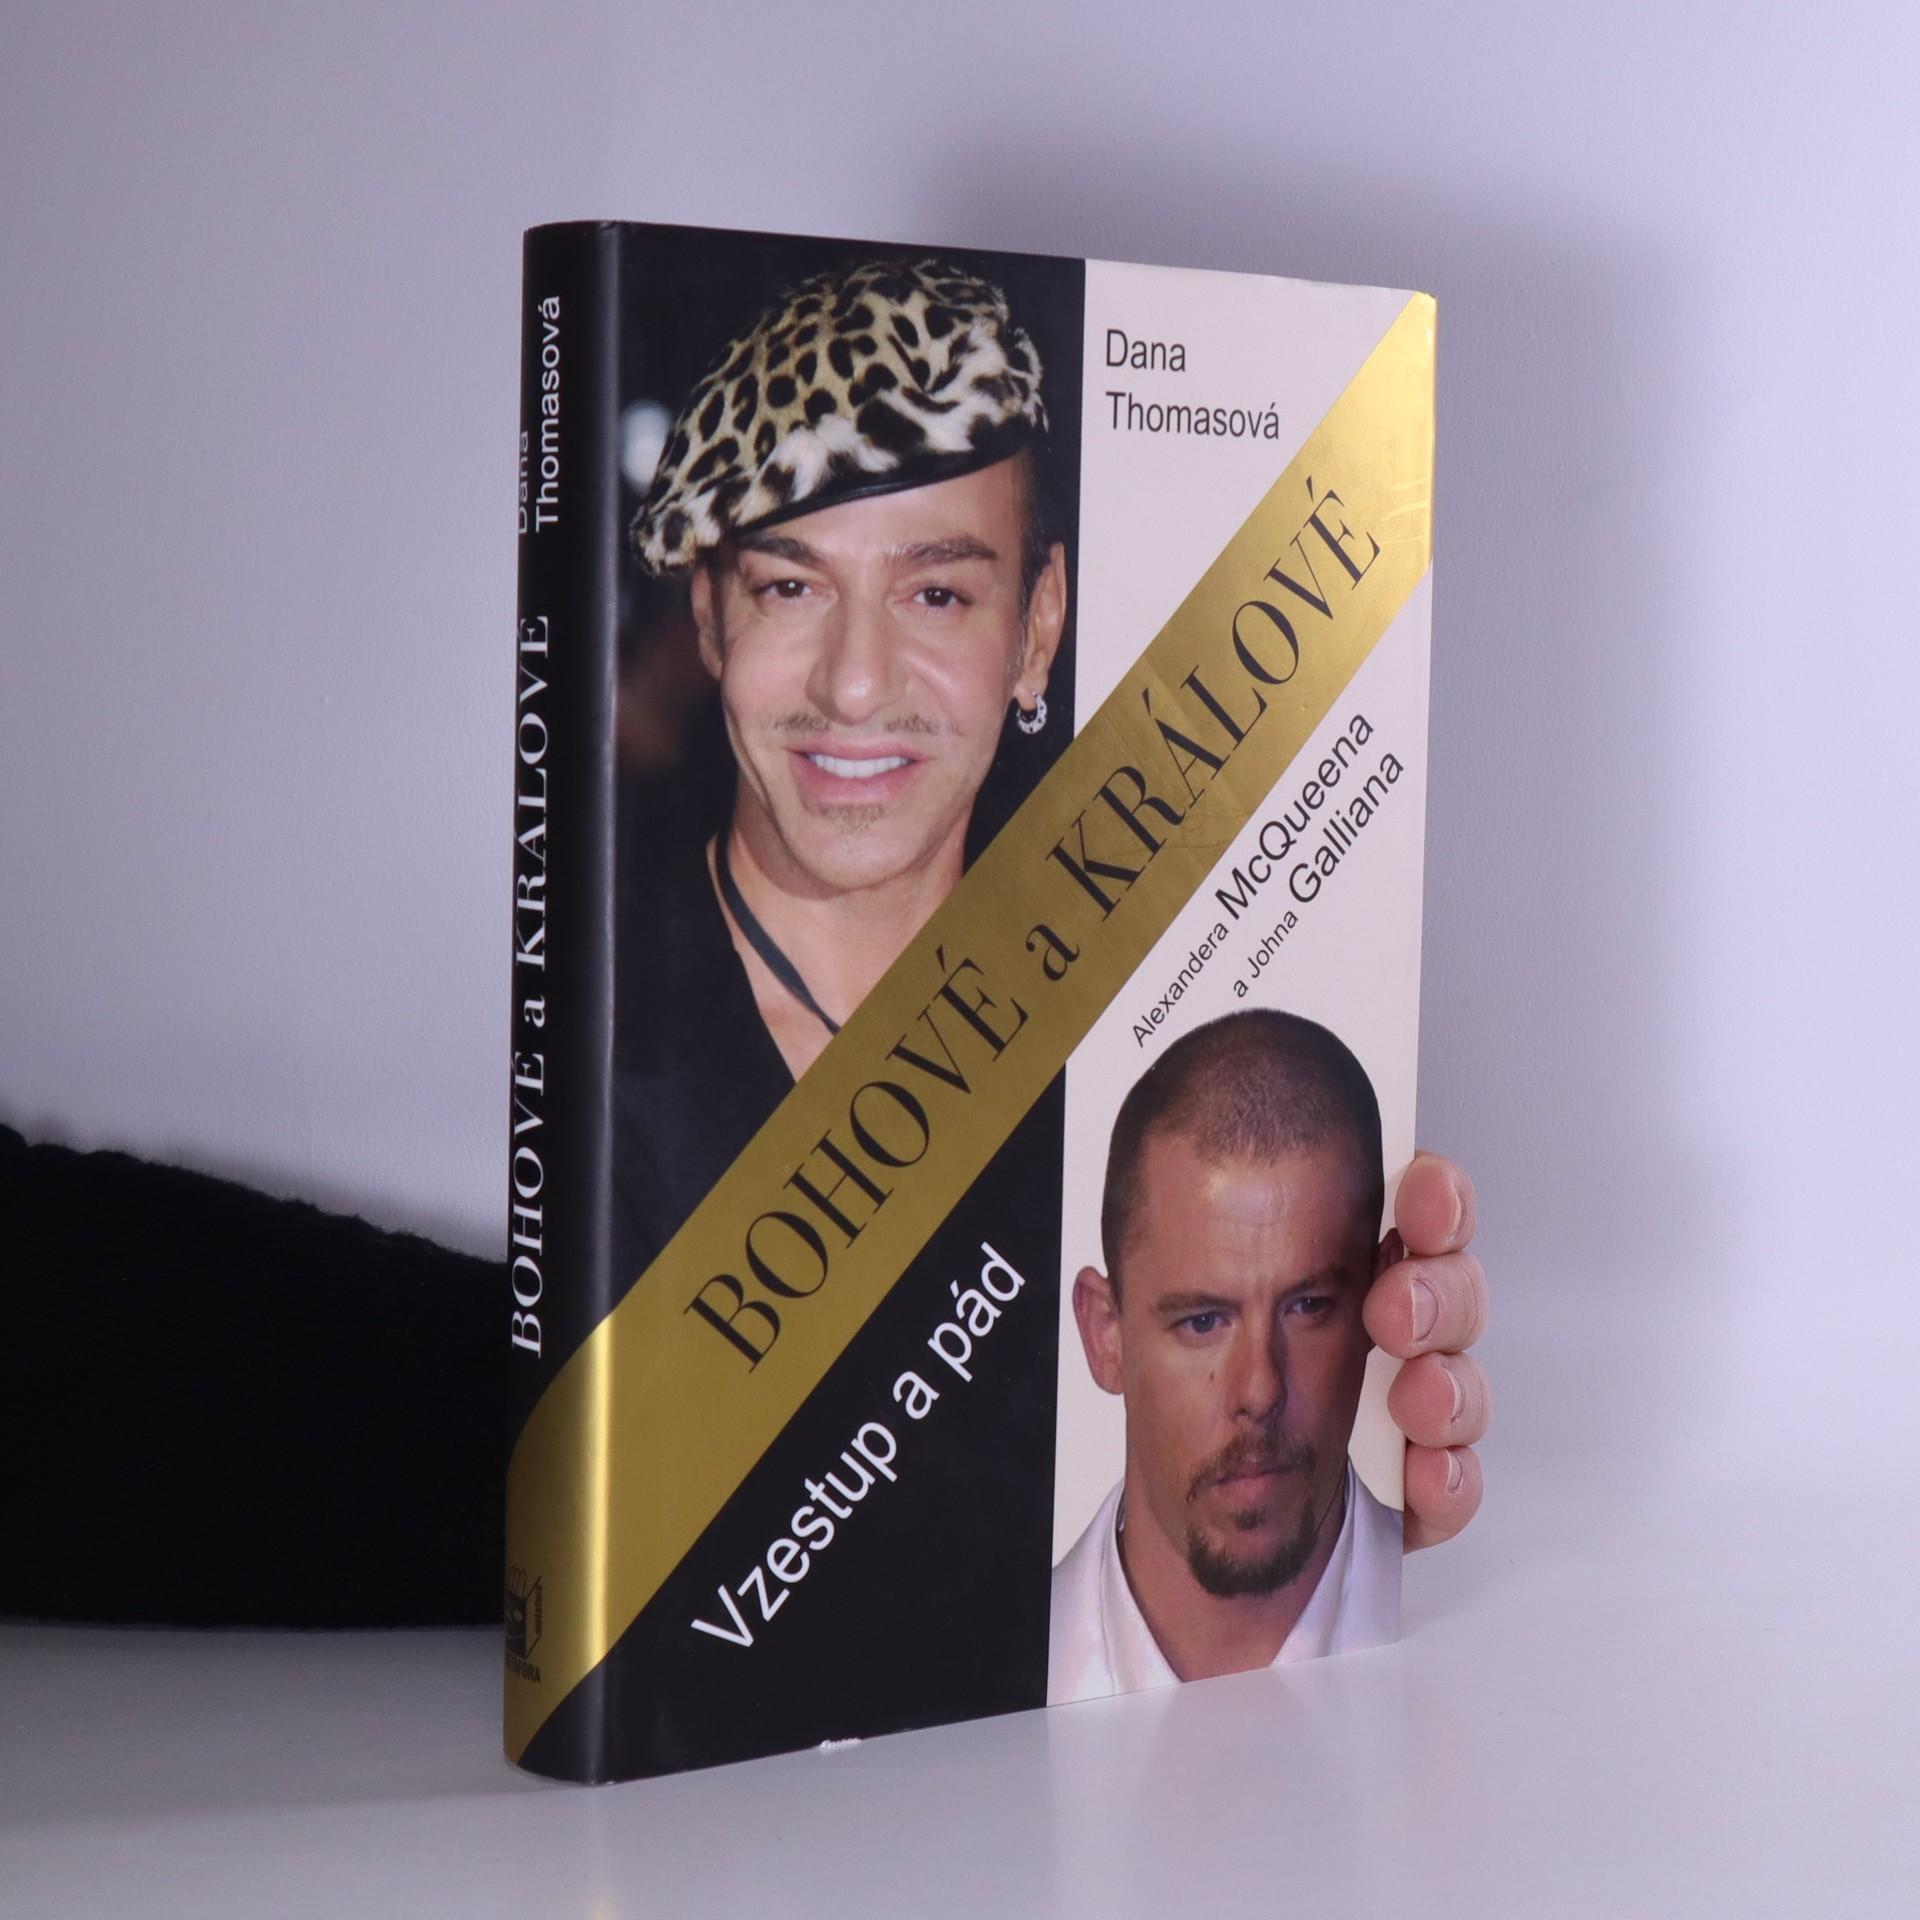 antikvární kniha Bohové a králové : vzestup a pád Alexandera McQueena a Johna Galliana, 2016